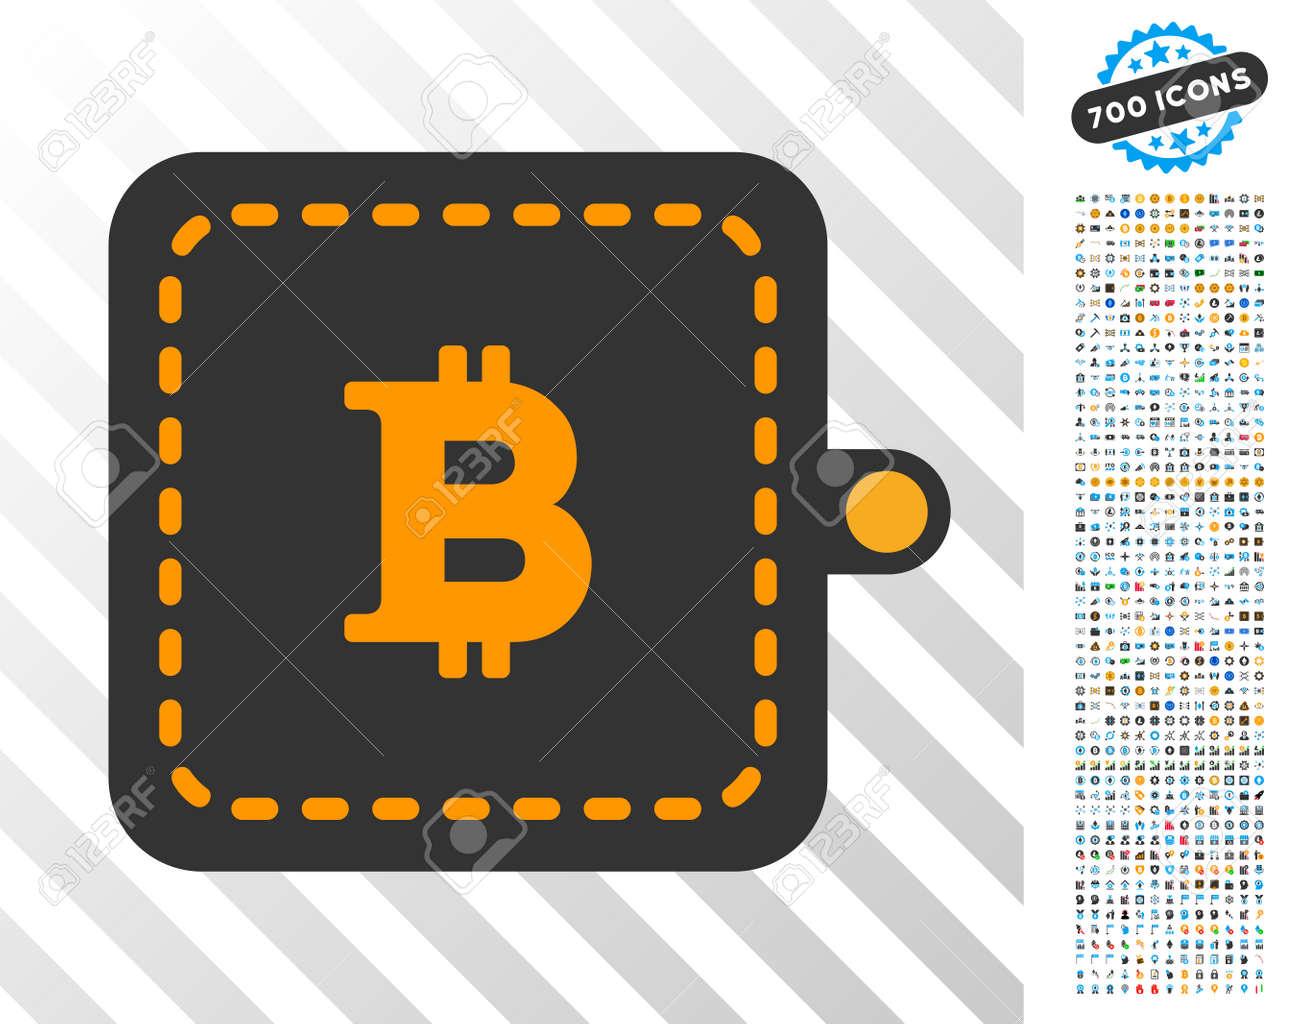 websites mining cryptocurrency